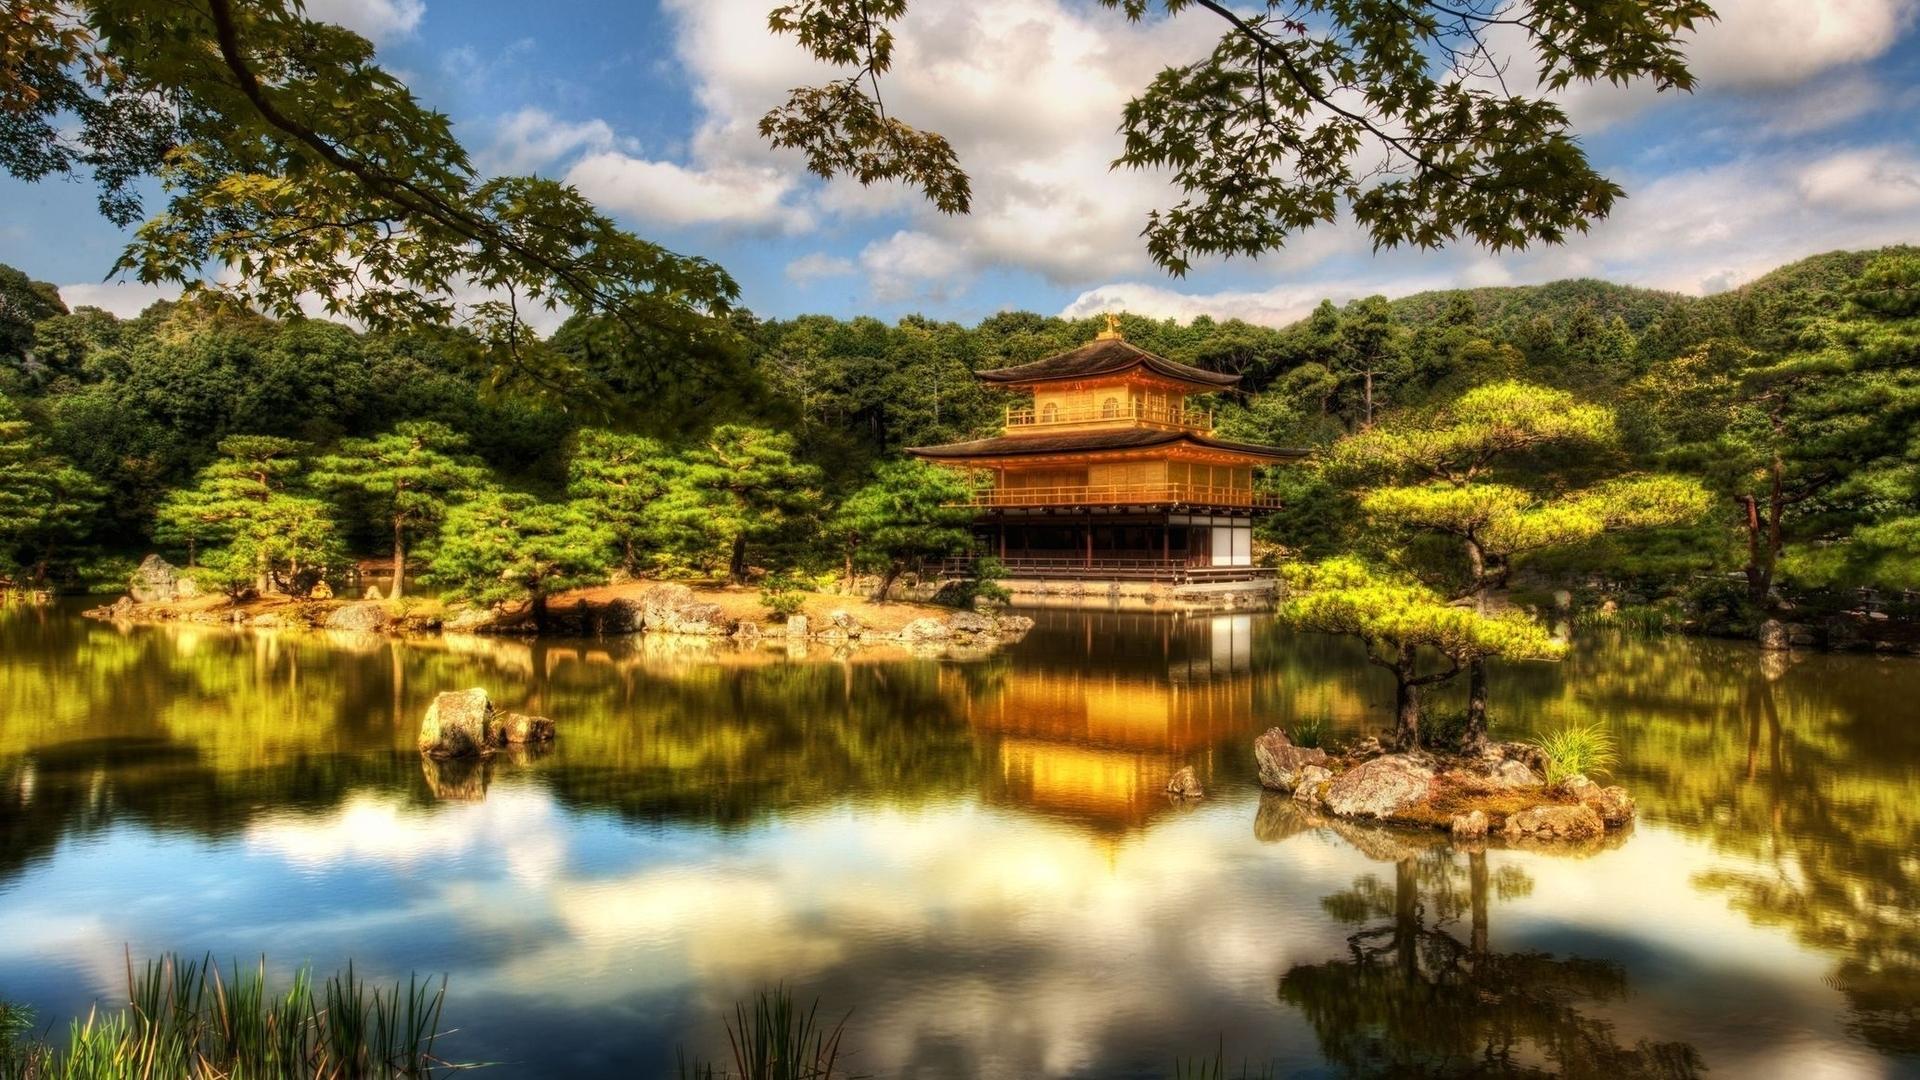 ryoanji zen garden japan mirabell gardens austria wallpaper desktop